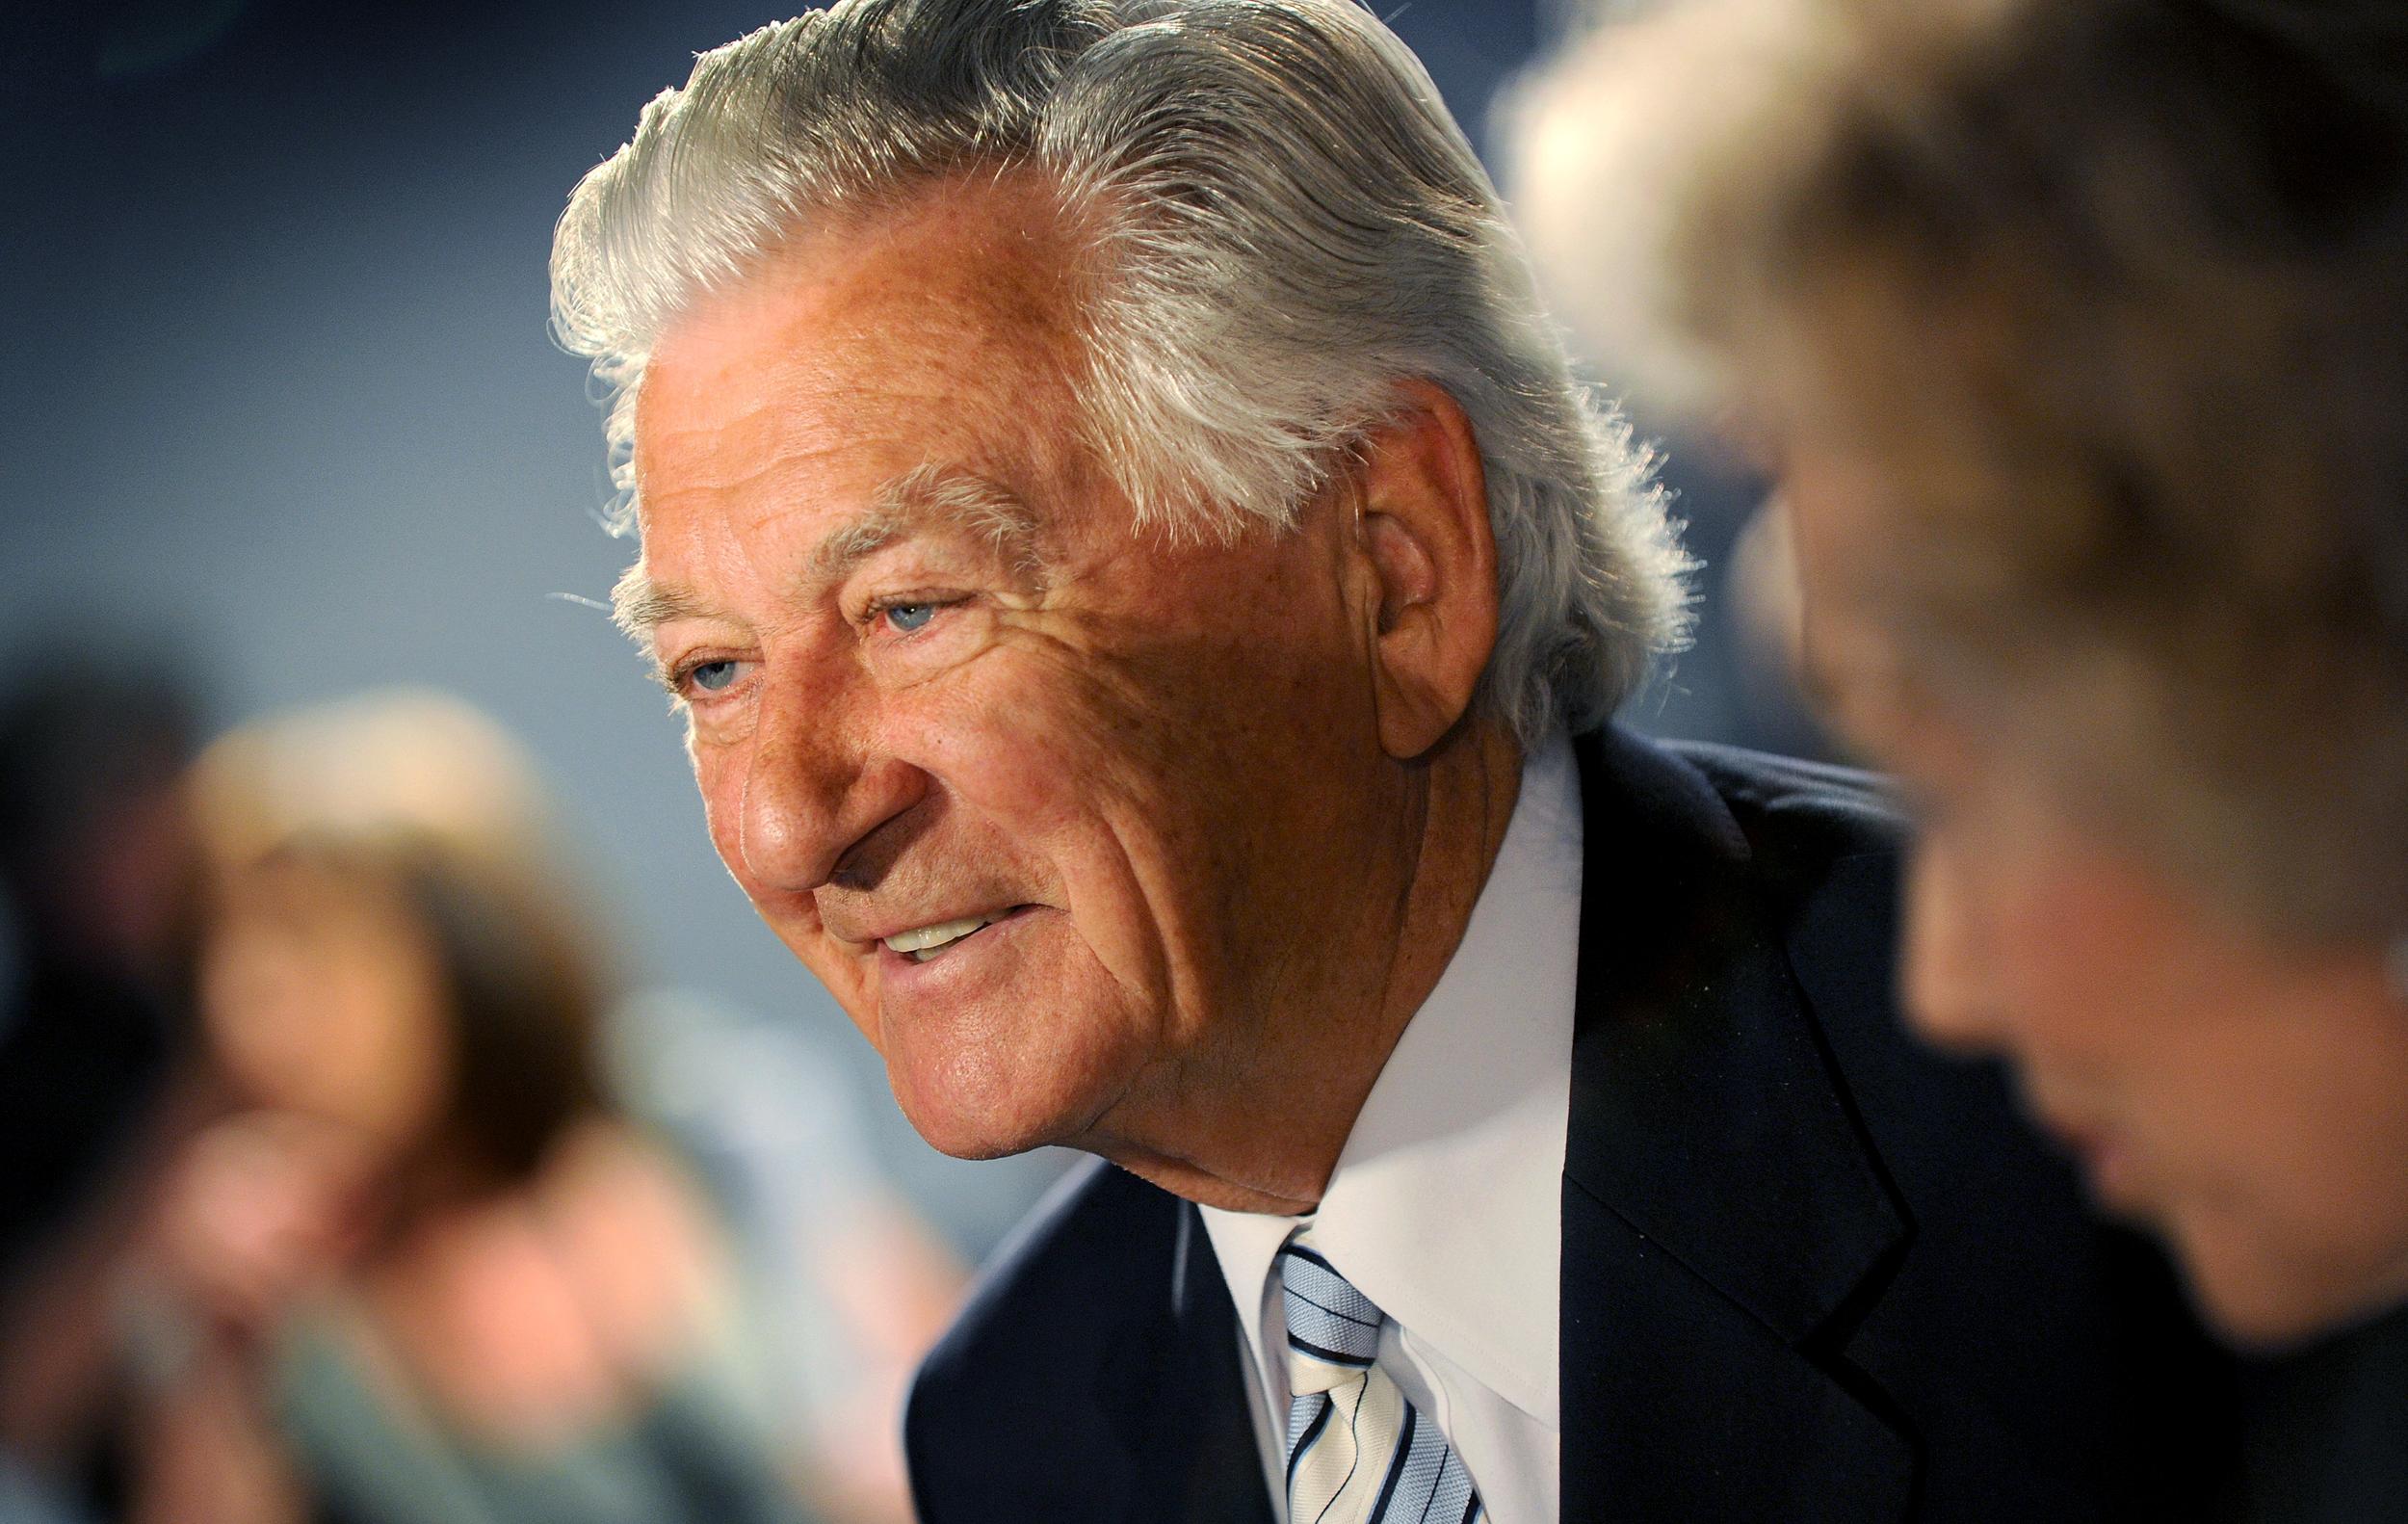 Ex-Australian-Prime-Minister-Bob-Hawke-dies-at-age-89